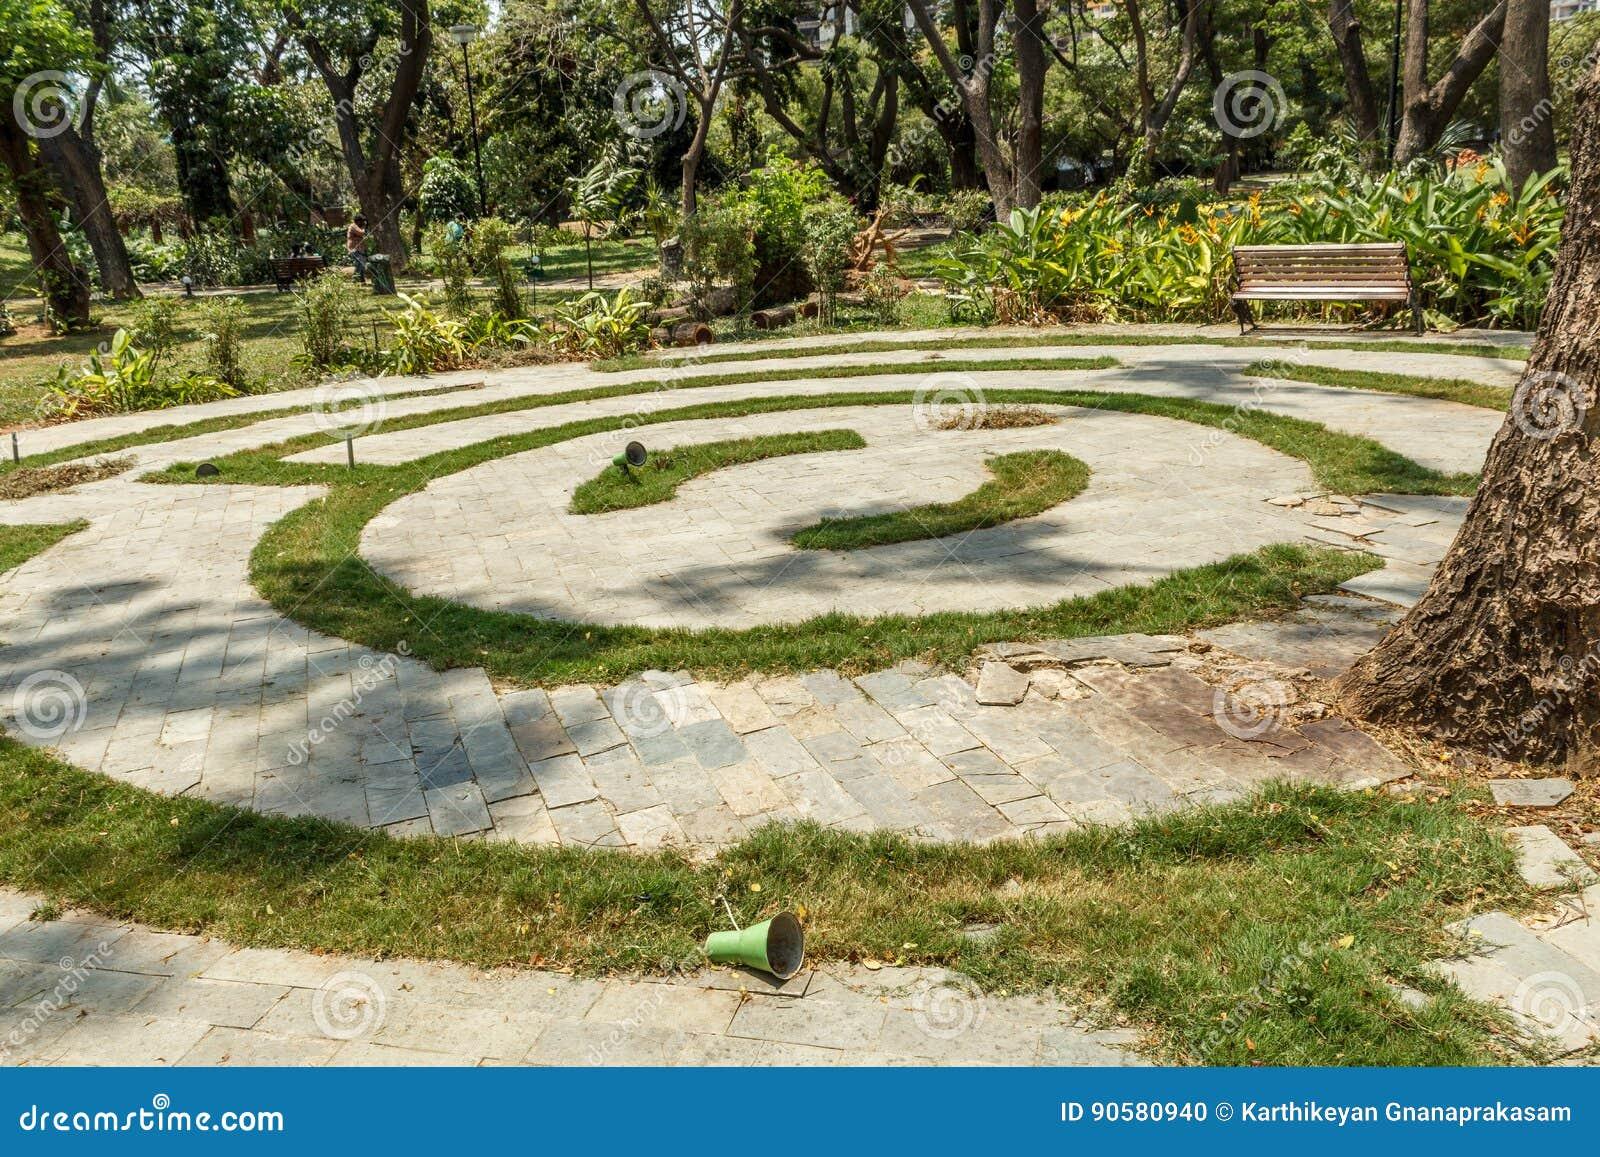 wide view of circular concrete steps in a green garden, chennai